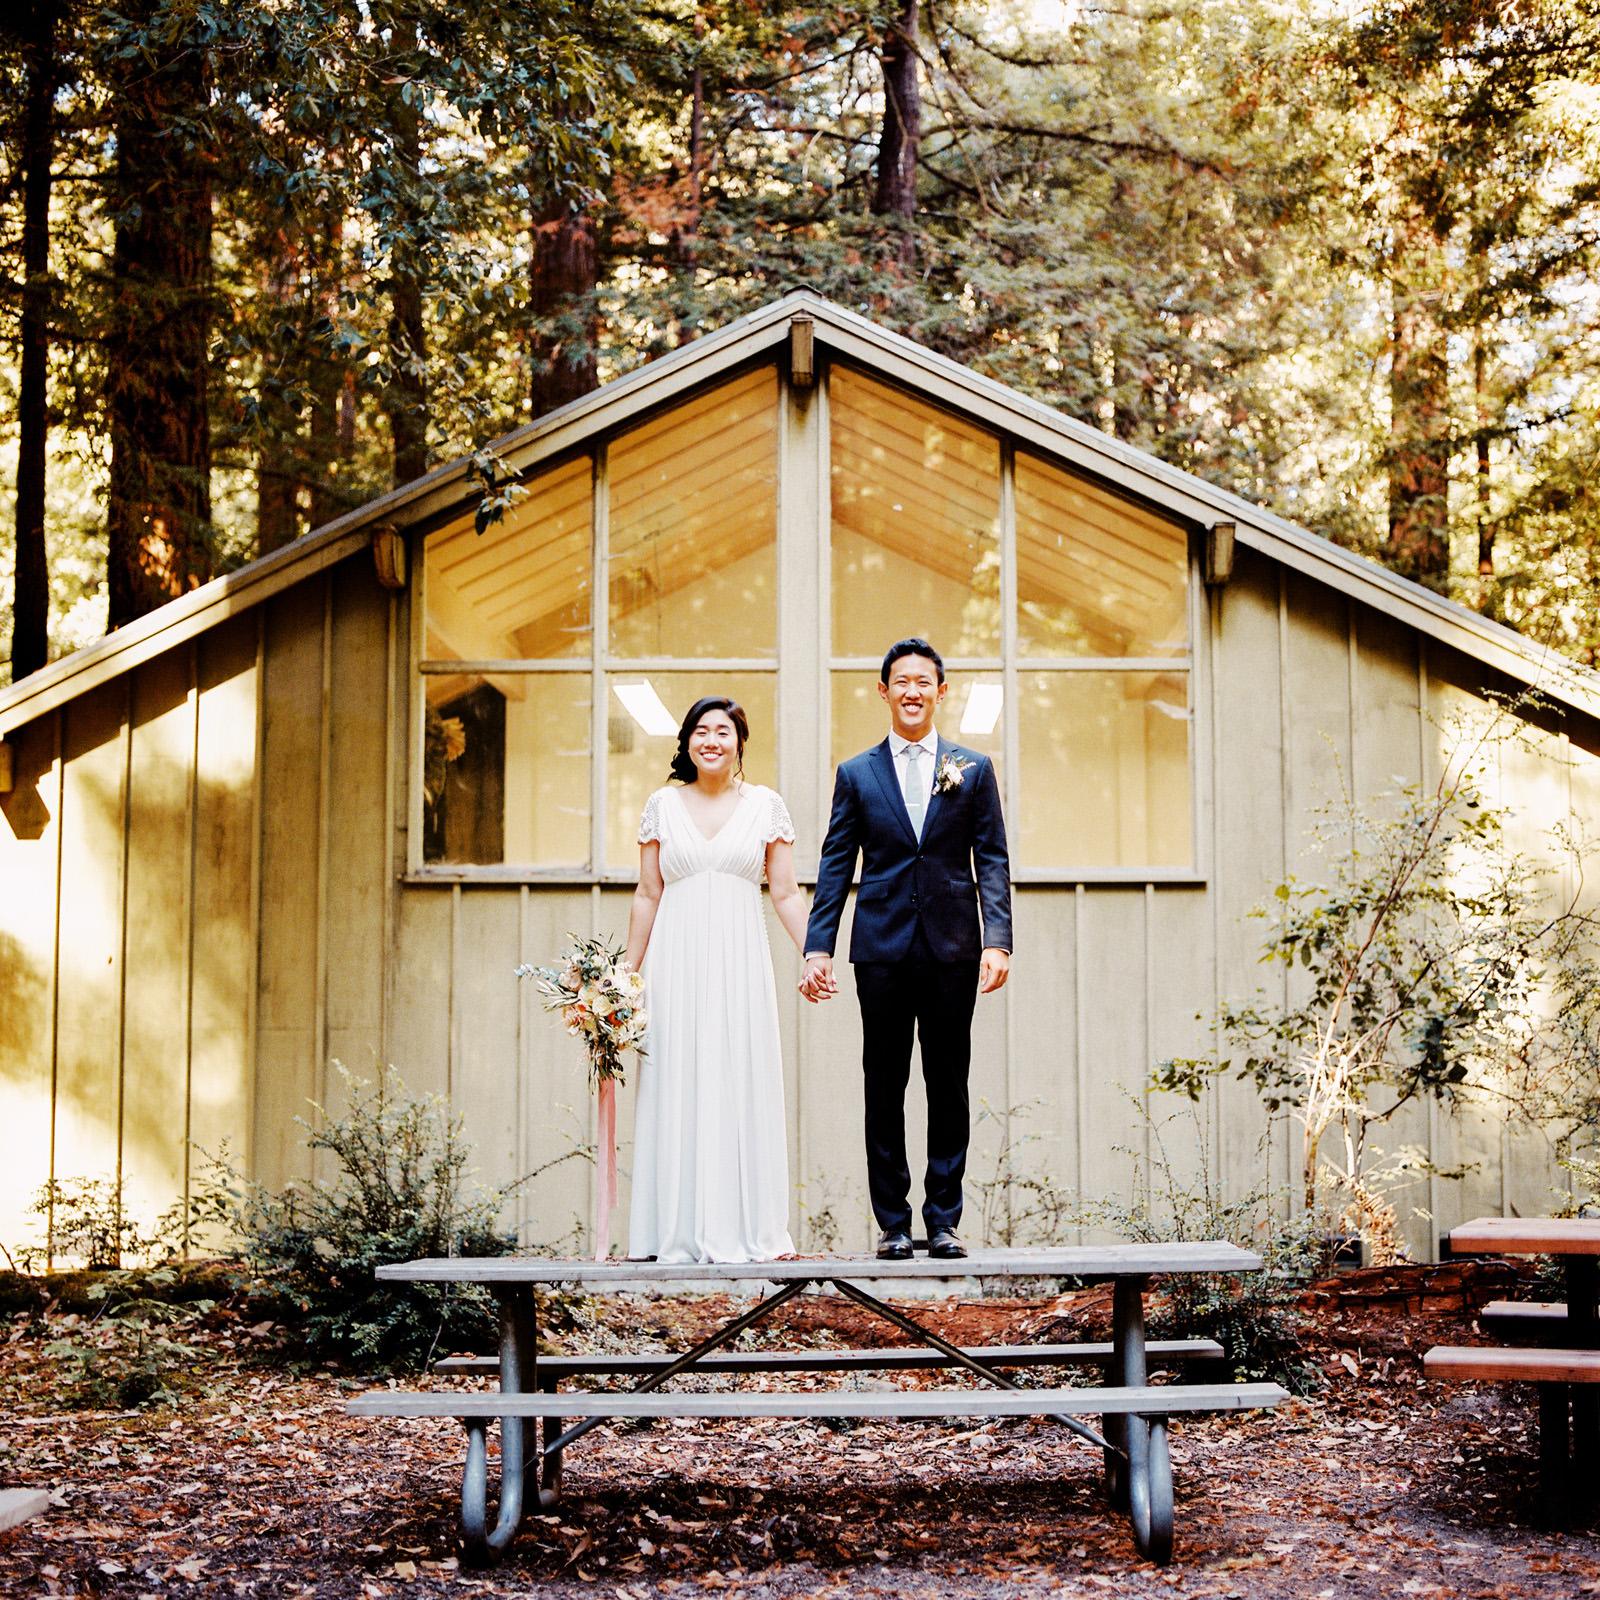 kimclay-blog-012 REDWOOD FOREST WEDDING